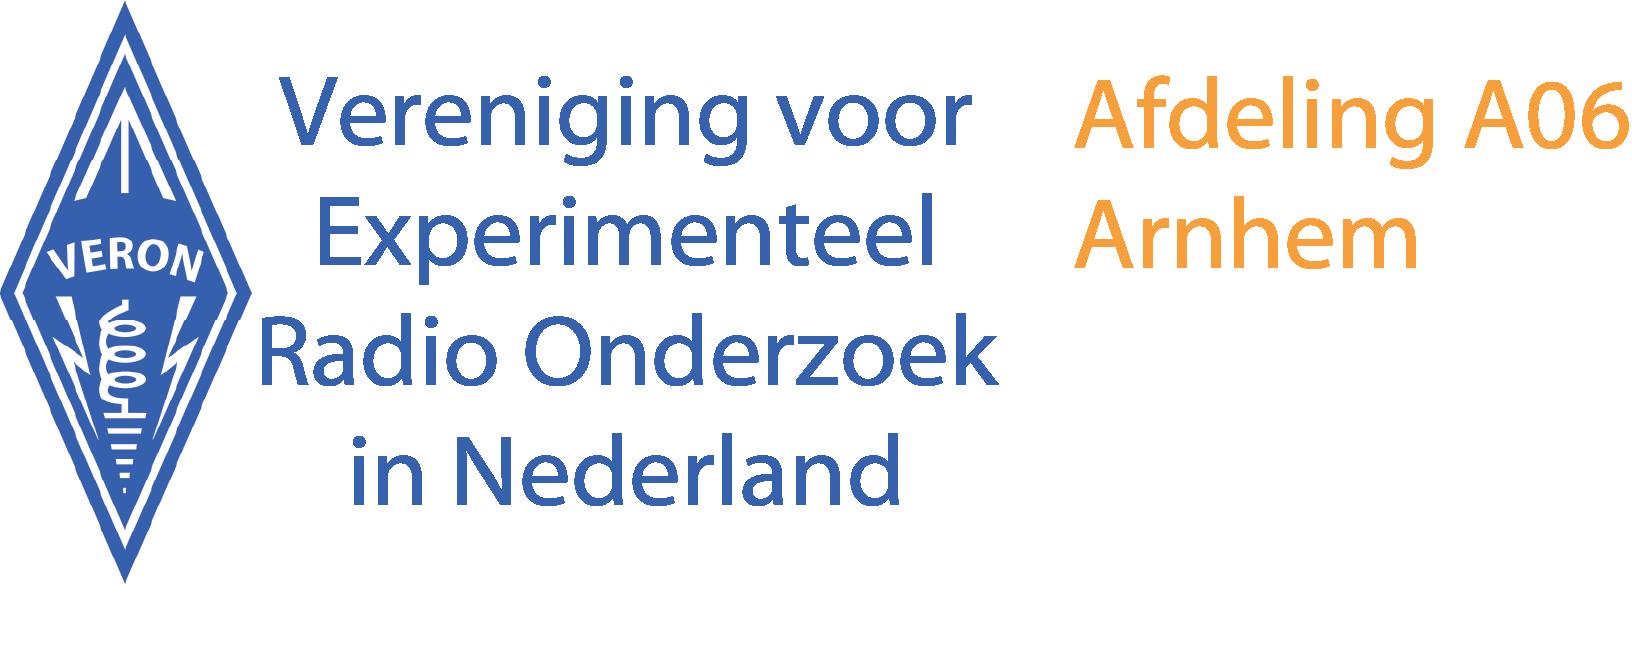 VERON a06 - Arnhem